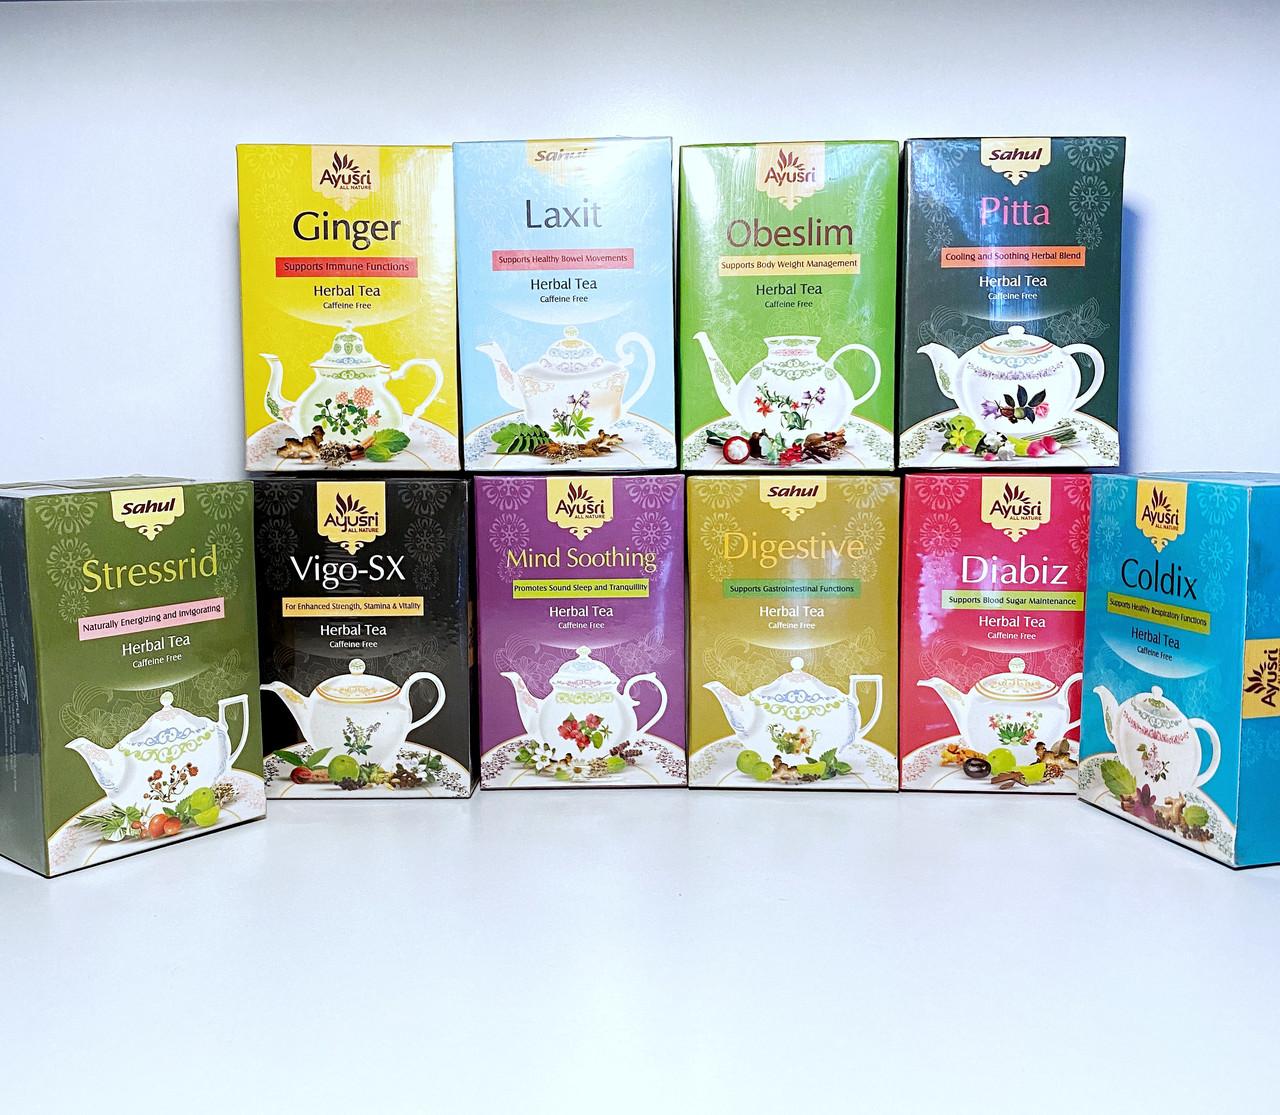 Аюрведический чай для пищеварения Дайджестив, Digestive Herbal Tea, 40 гр, Sahul - фото 2